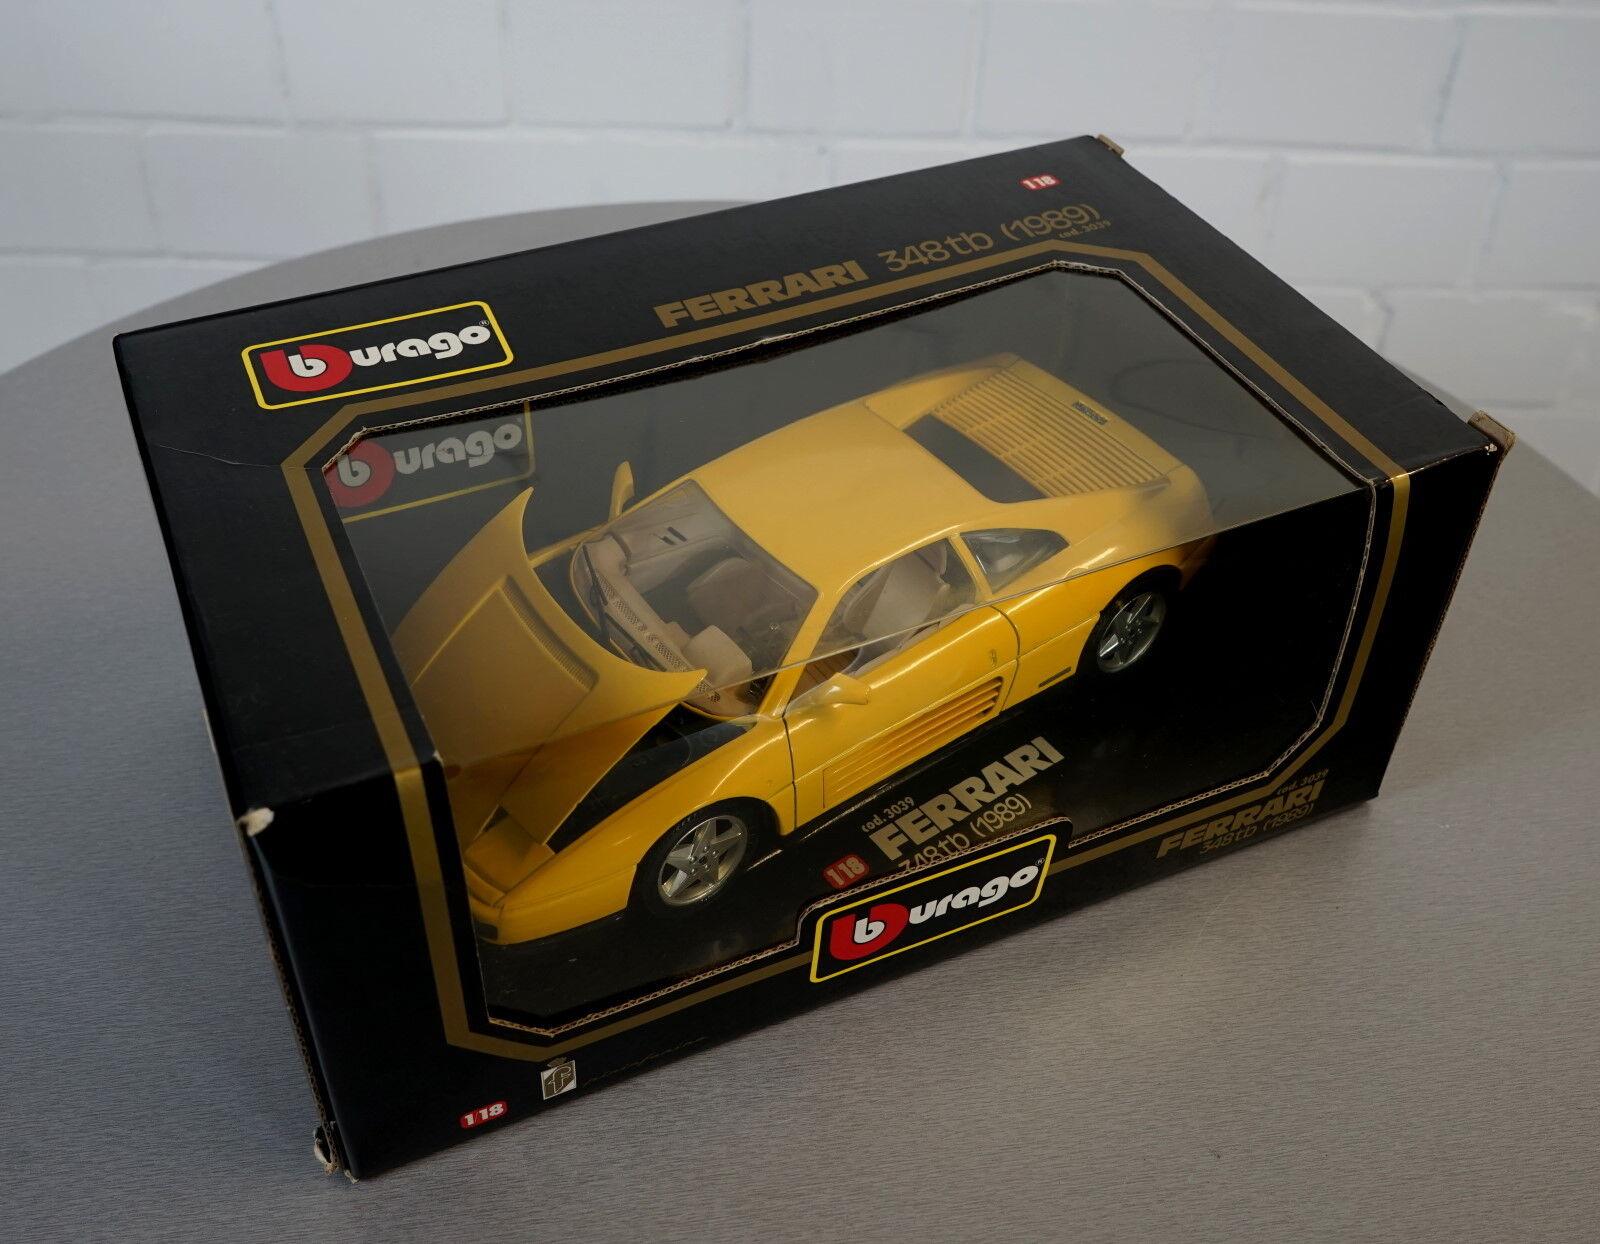 Burago 1 18 18 18 Ferrari 348tb (1989) yellow - 3039 - DieCast Scale Modell Auto NEU OVP 7a0146